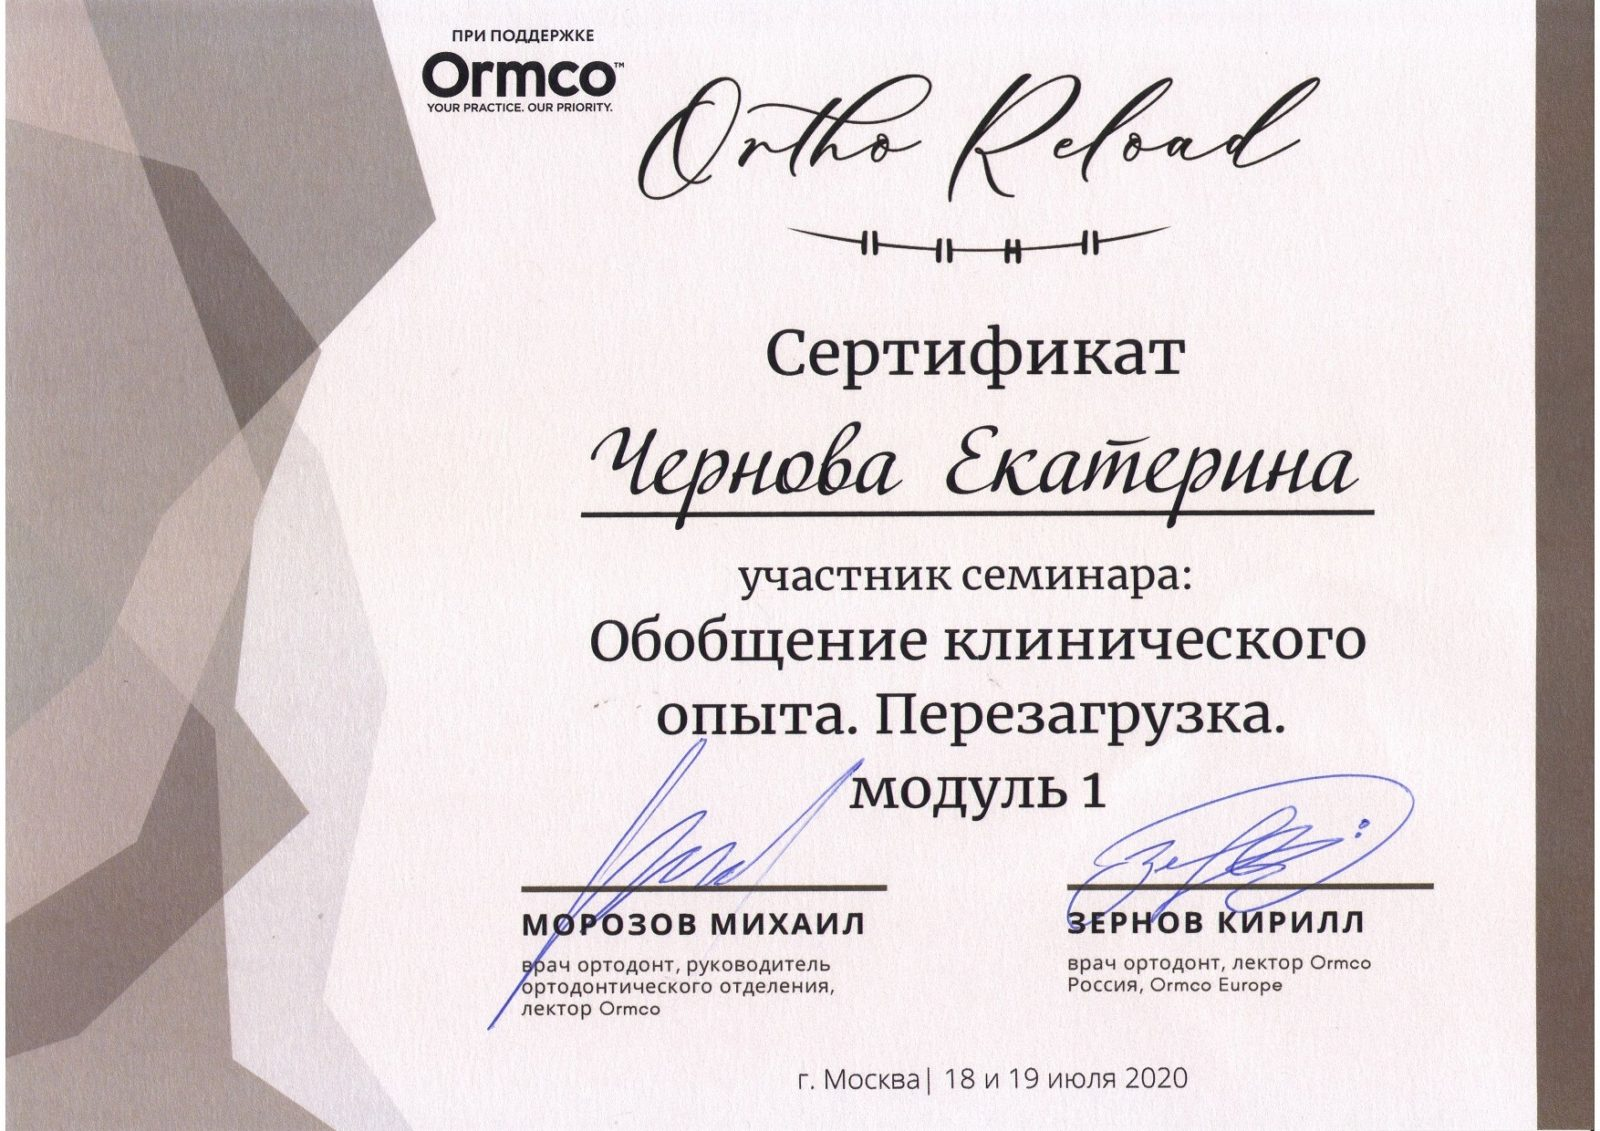 http://oris-vidnoe.ru/wp-content/uploads/2021/06/chernova-1.jpg